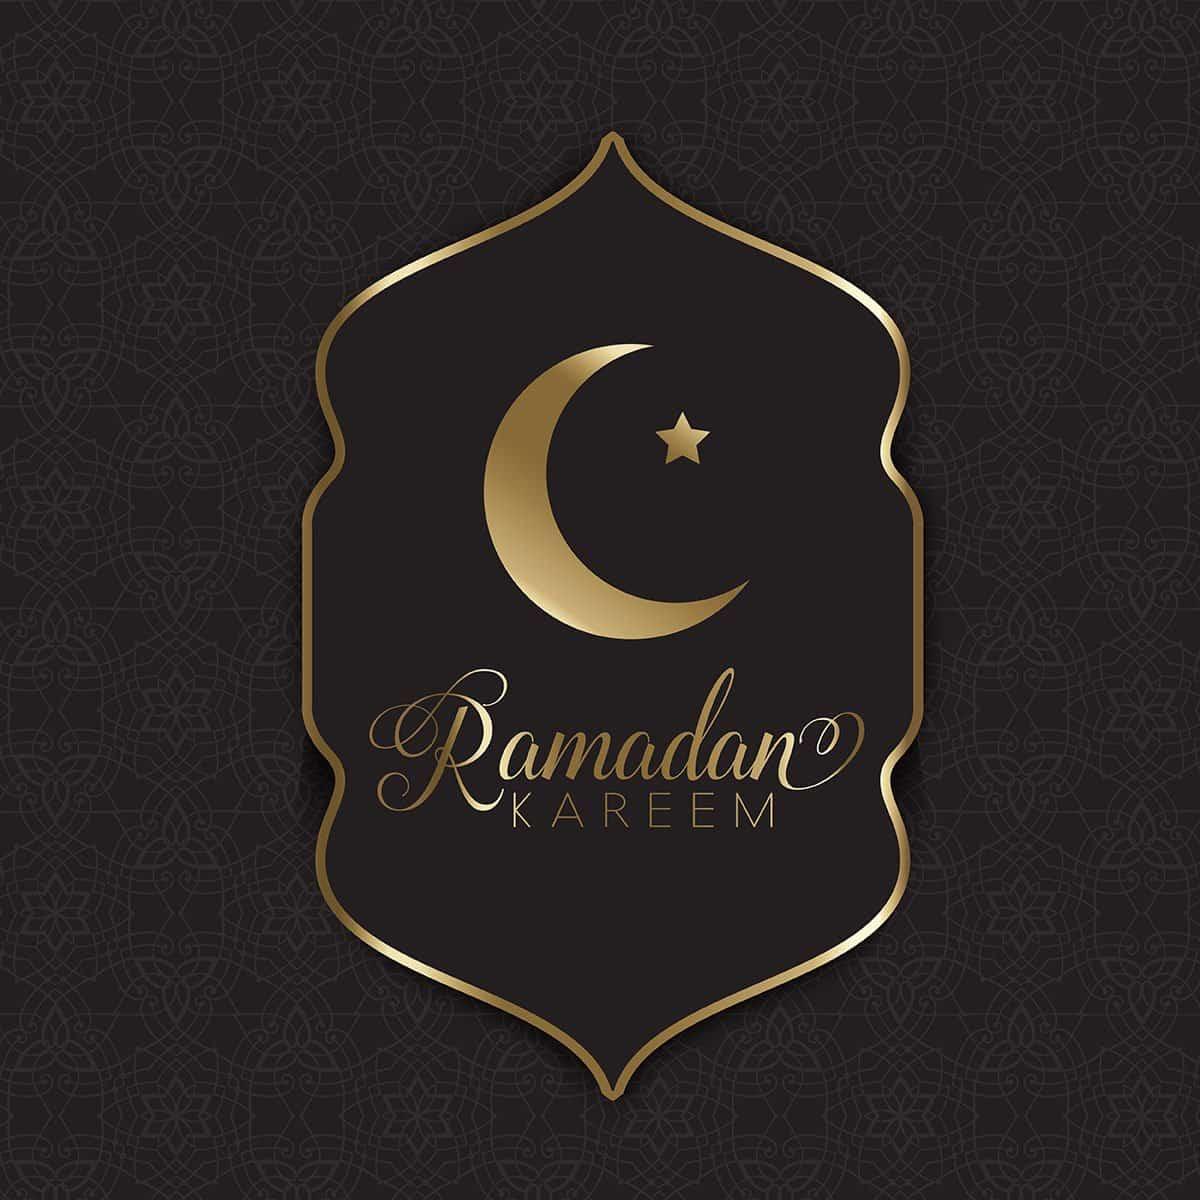 Gold and black Ramadan background